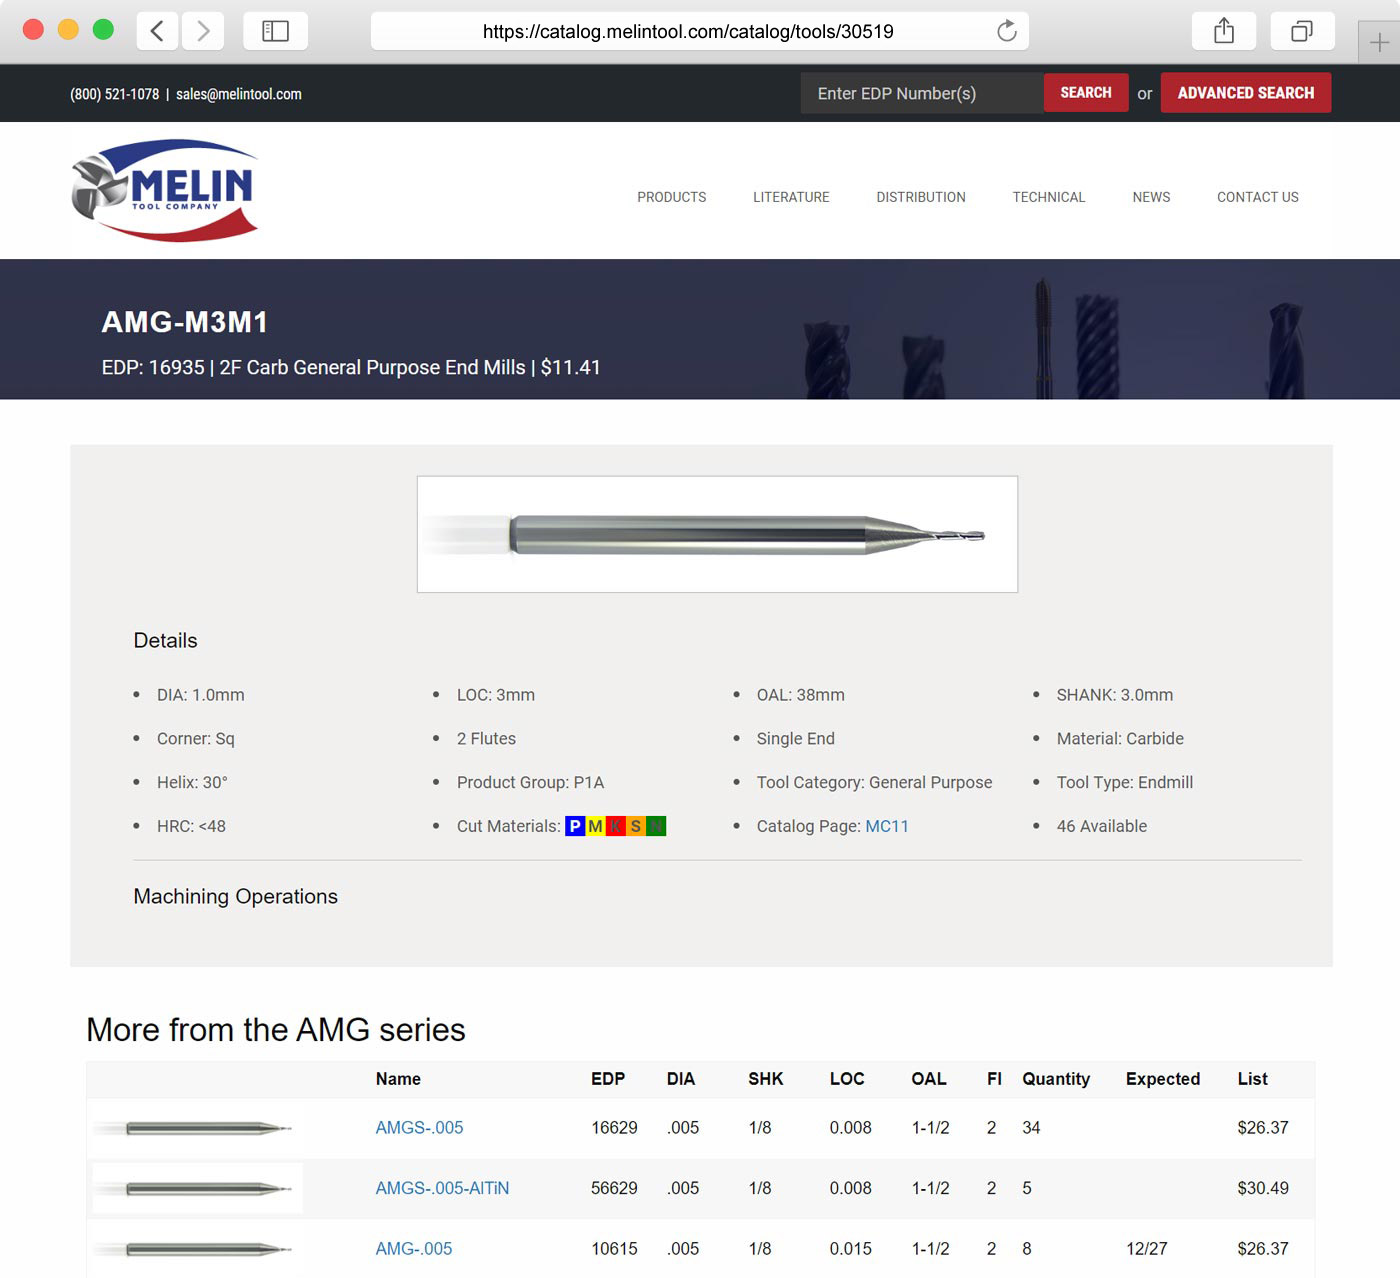 Melin Tool website catalog design